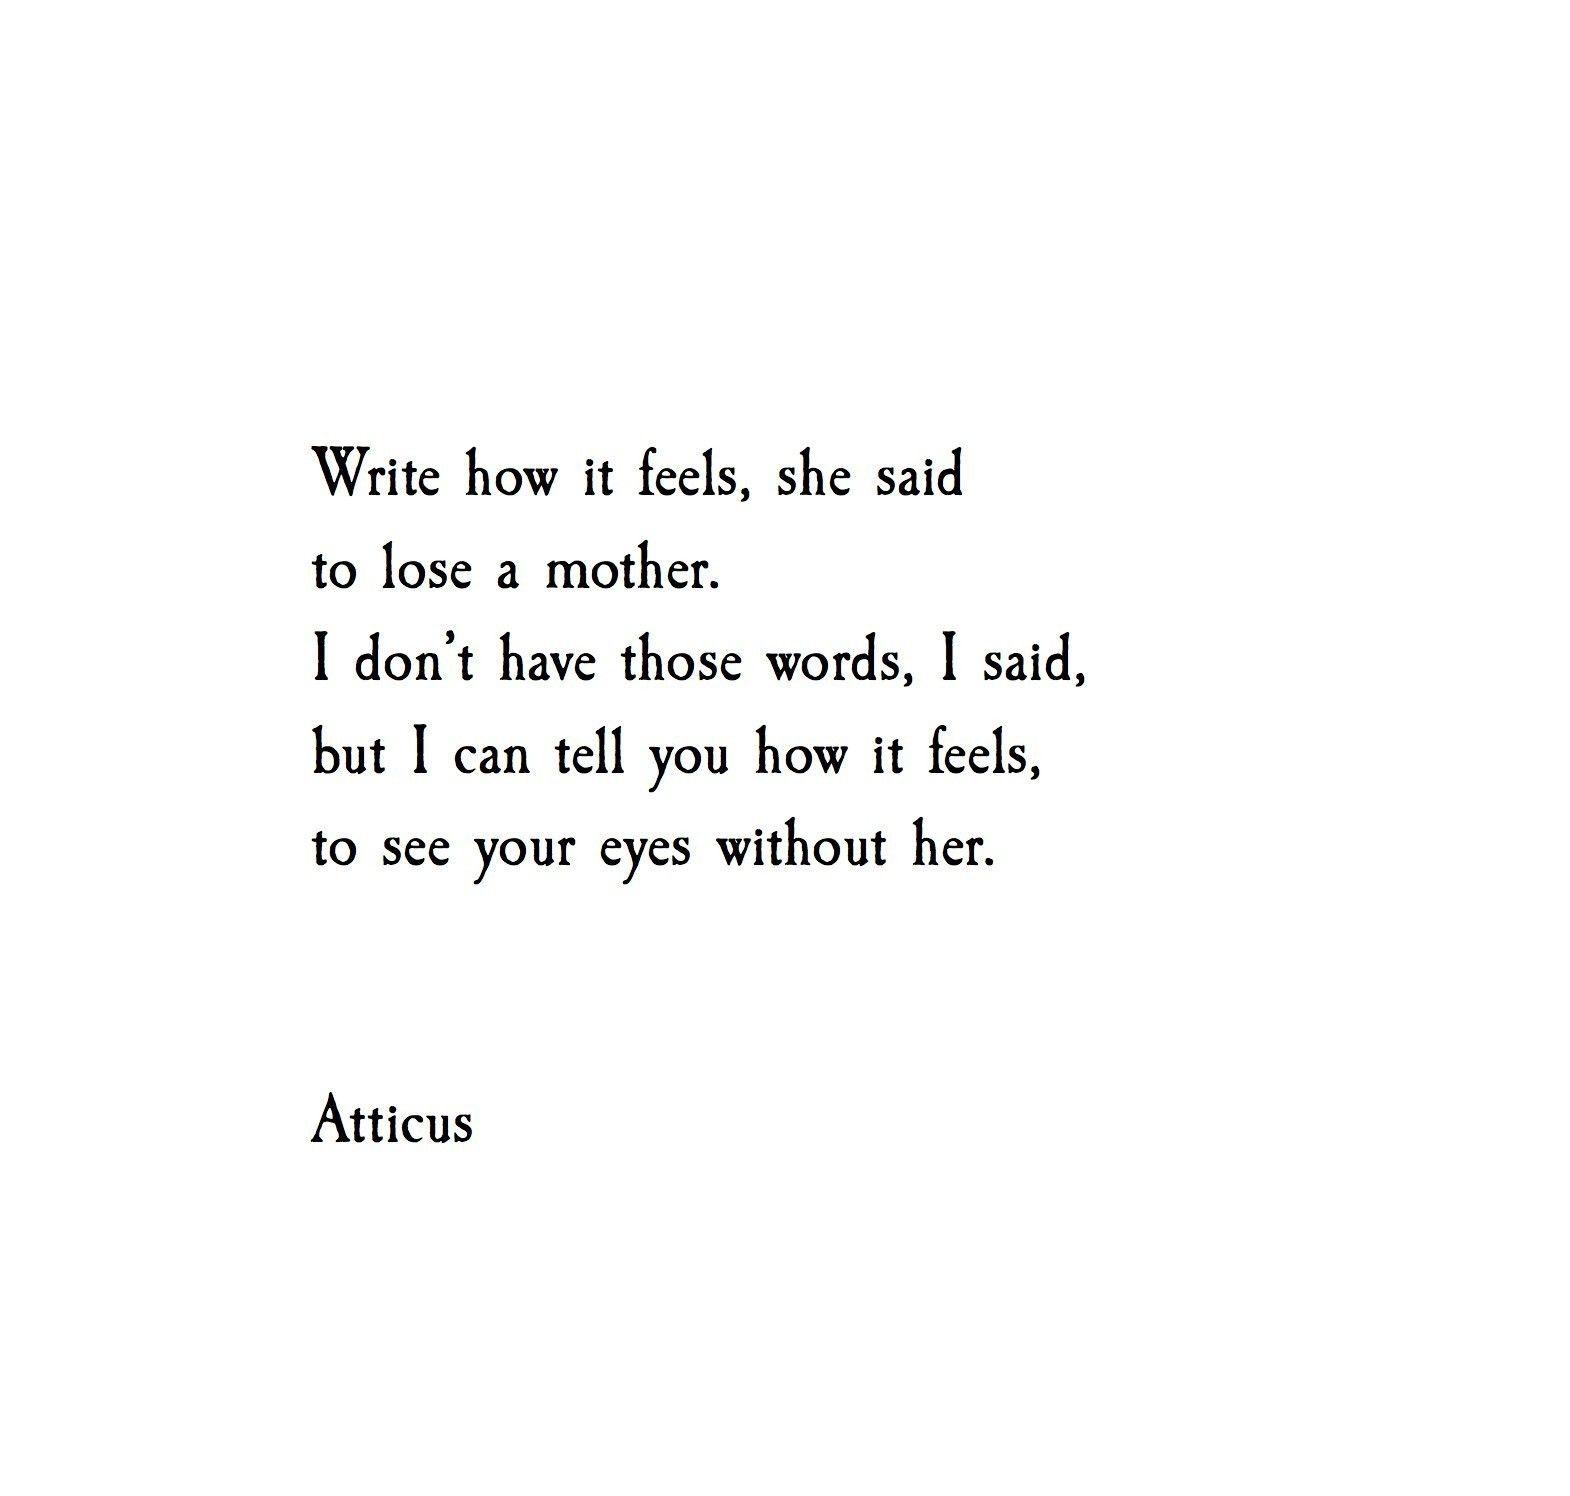 Your Eyes Atticuspoetry Atticuspoetry Atticus Poetry Eyes